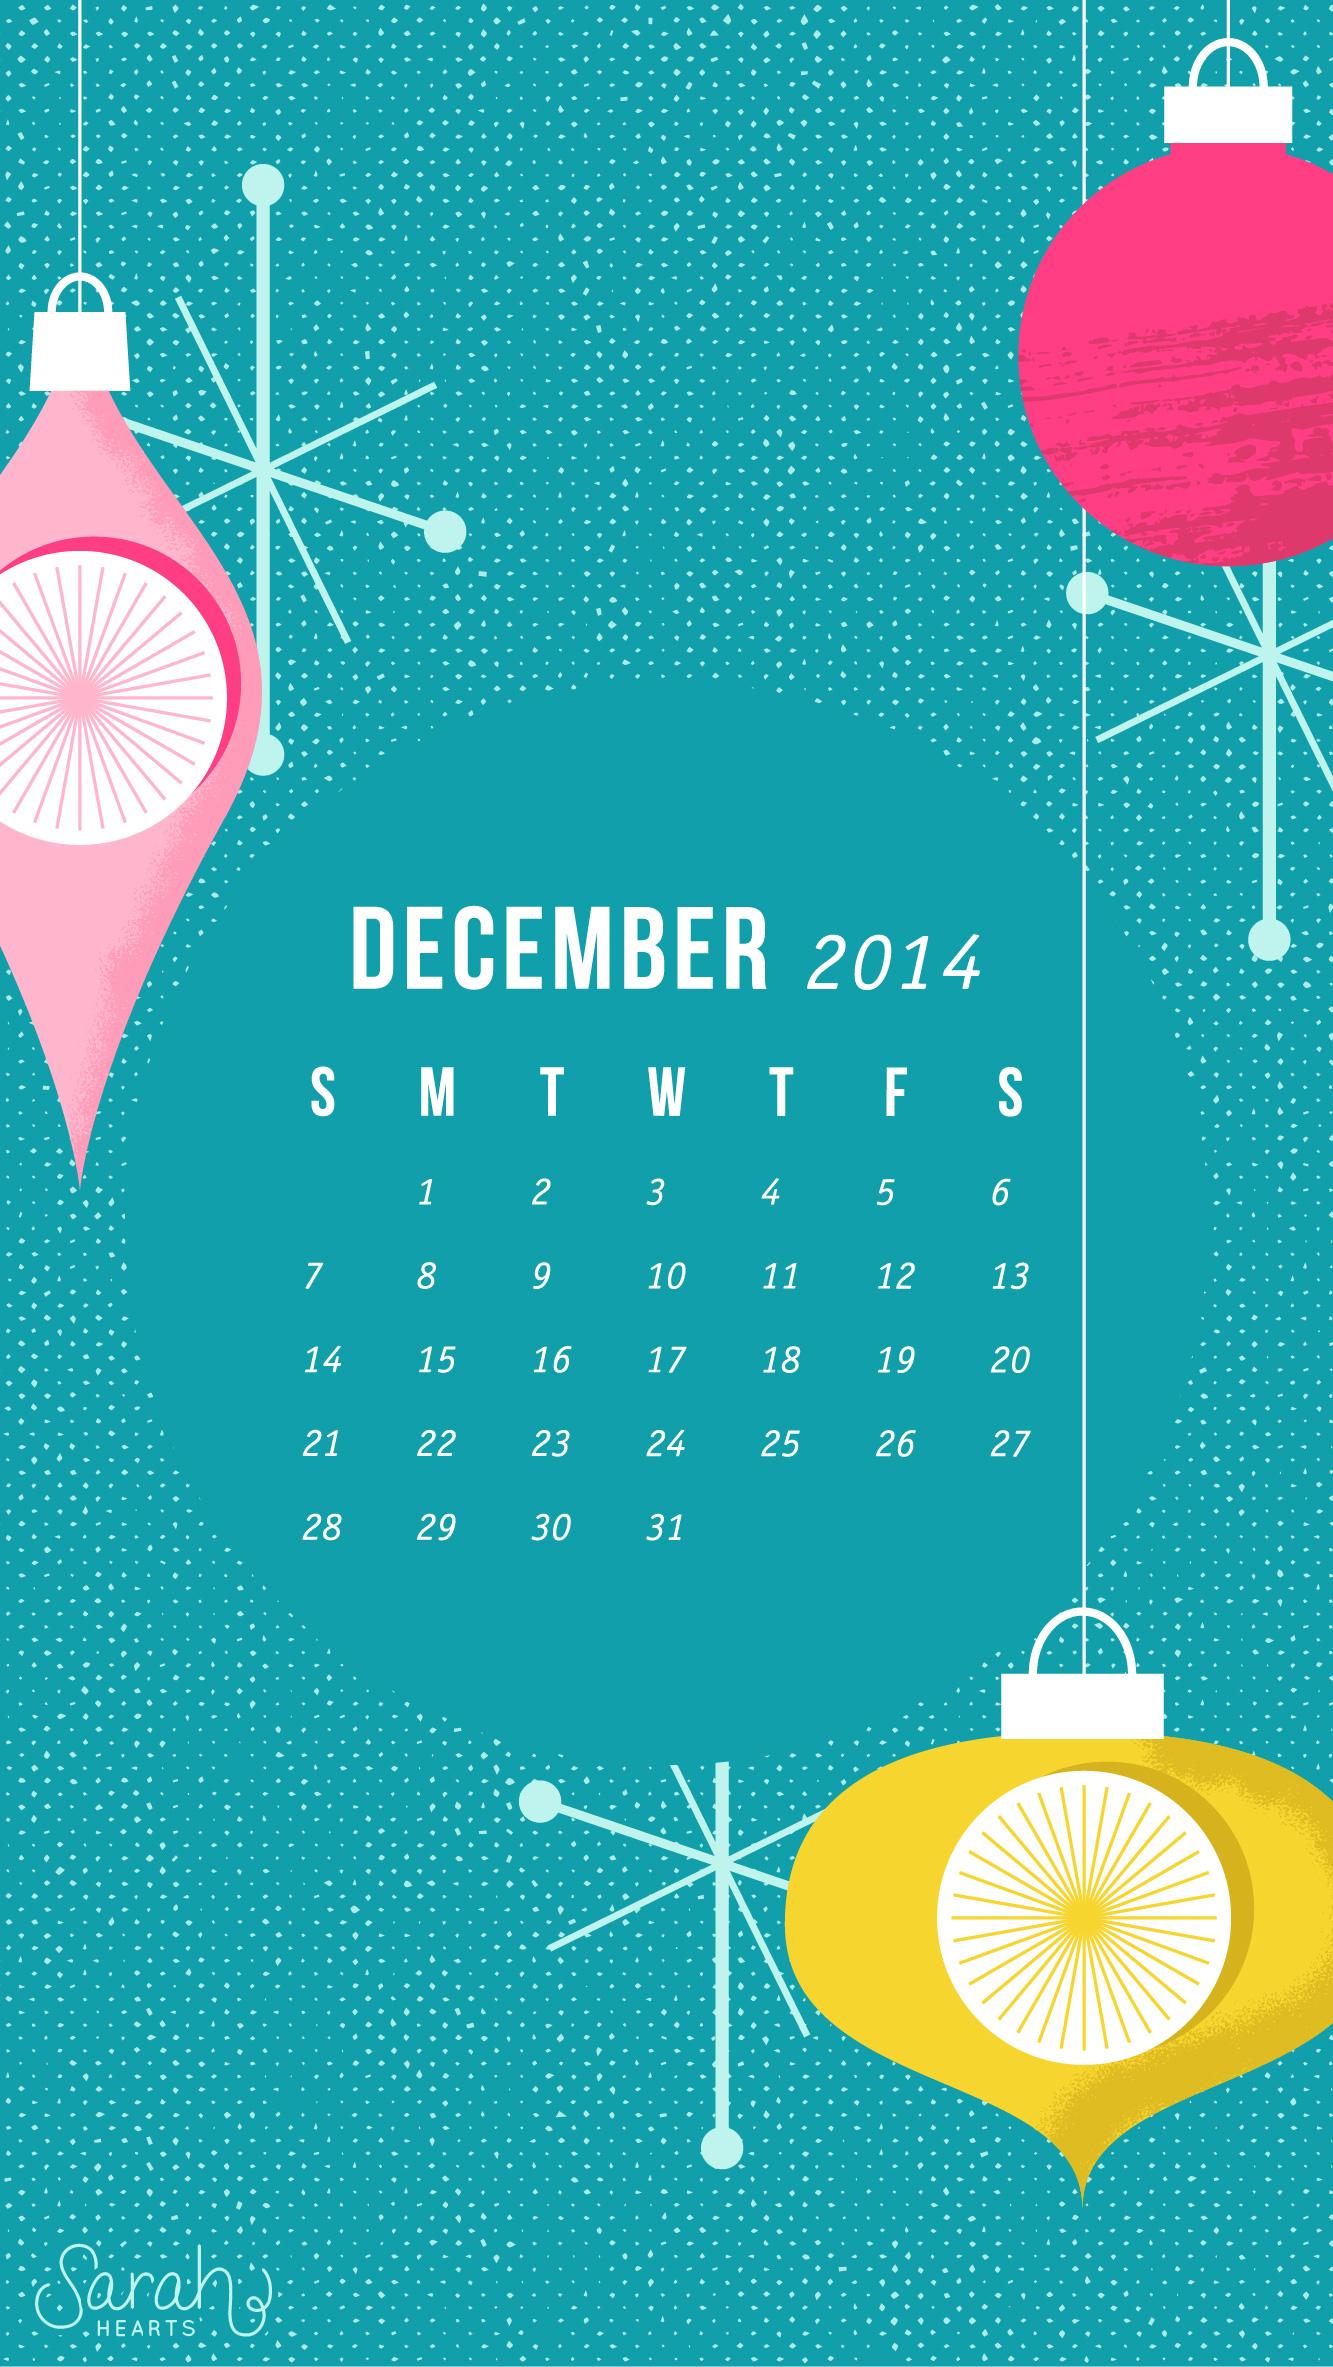 december 2014 calendar wallpaper sarah hearts